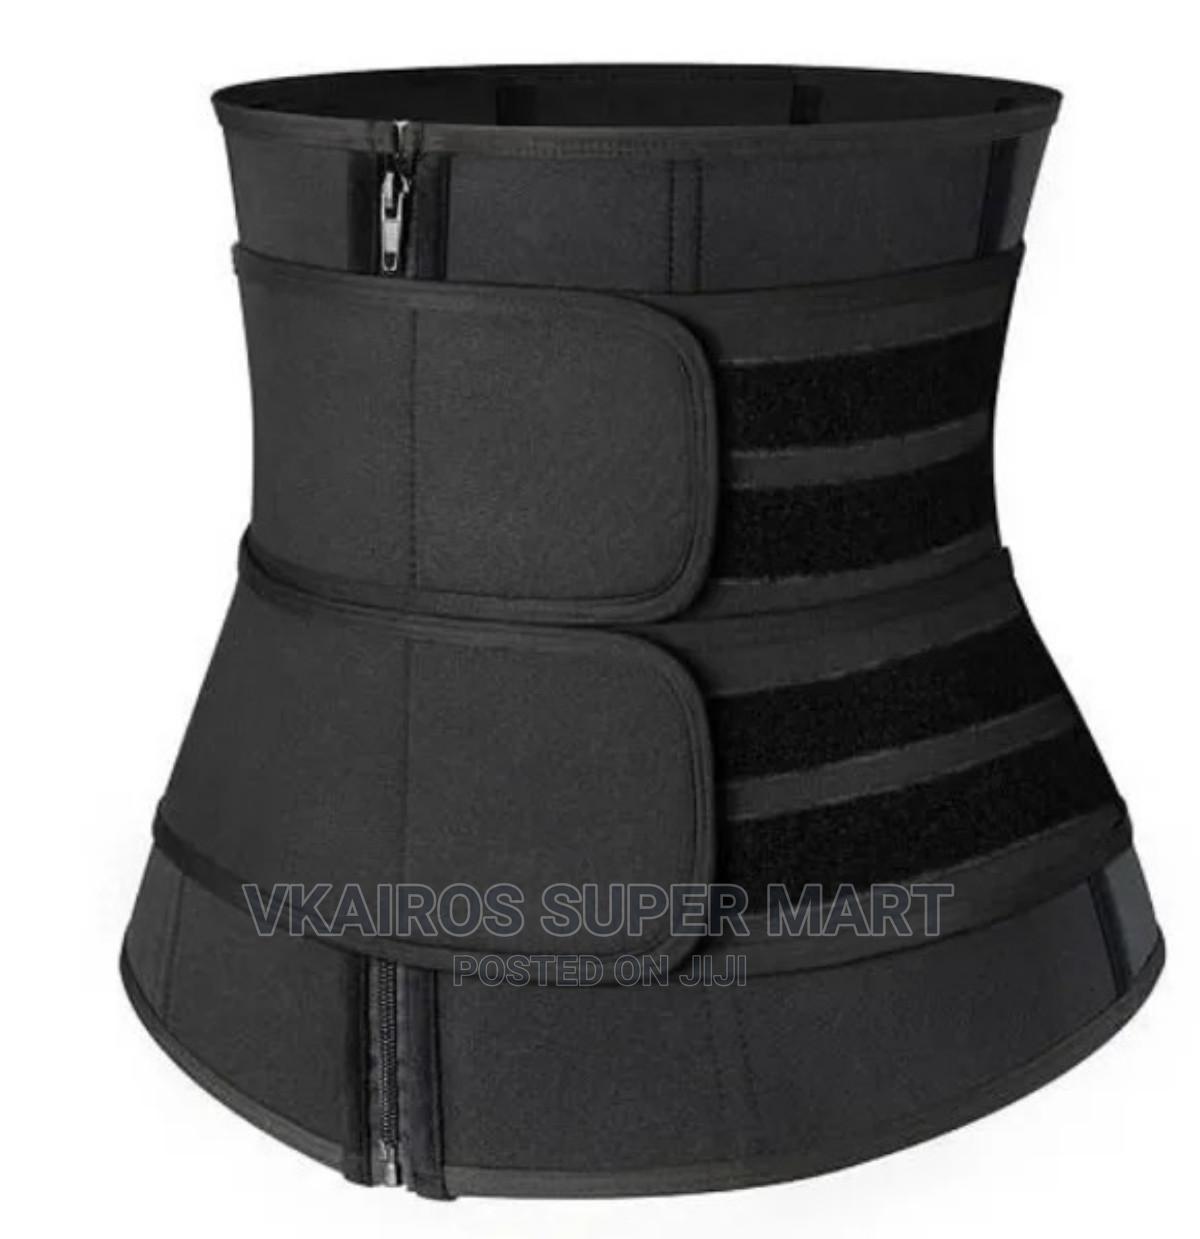 Tummy Shaper Underburst Corset Belt - Sizes M,L,XL,XXL 3XL   Clothing for sale in Surulere, Lagos State, Nigeria